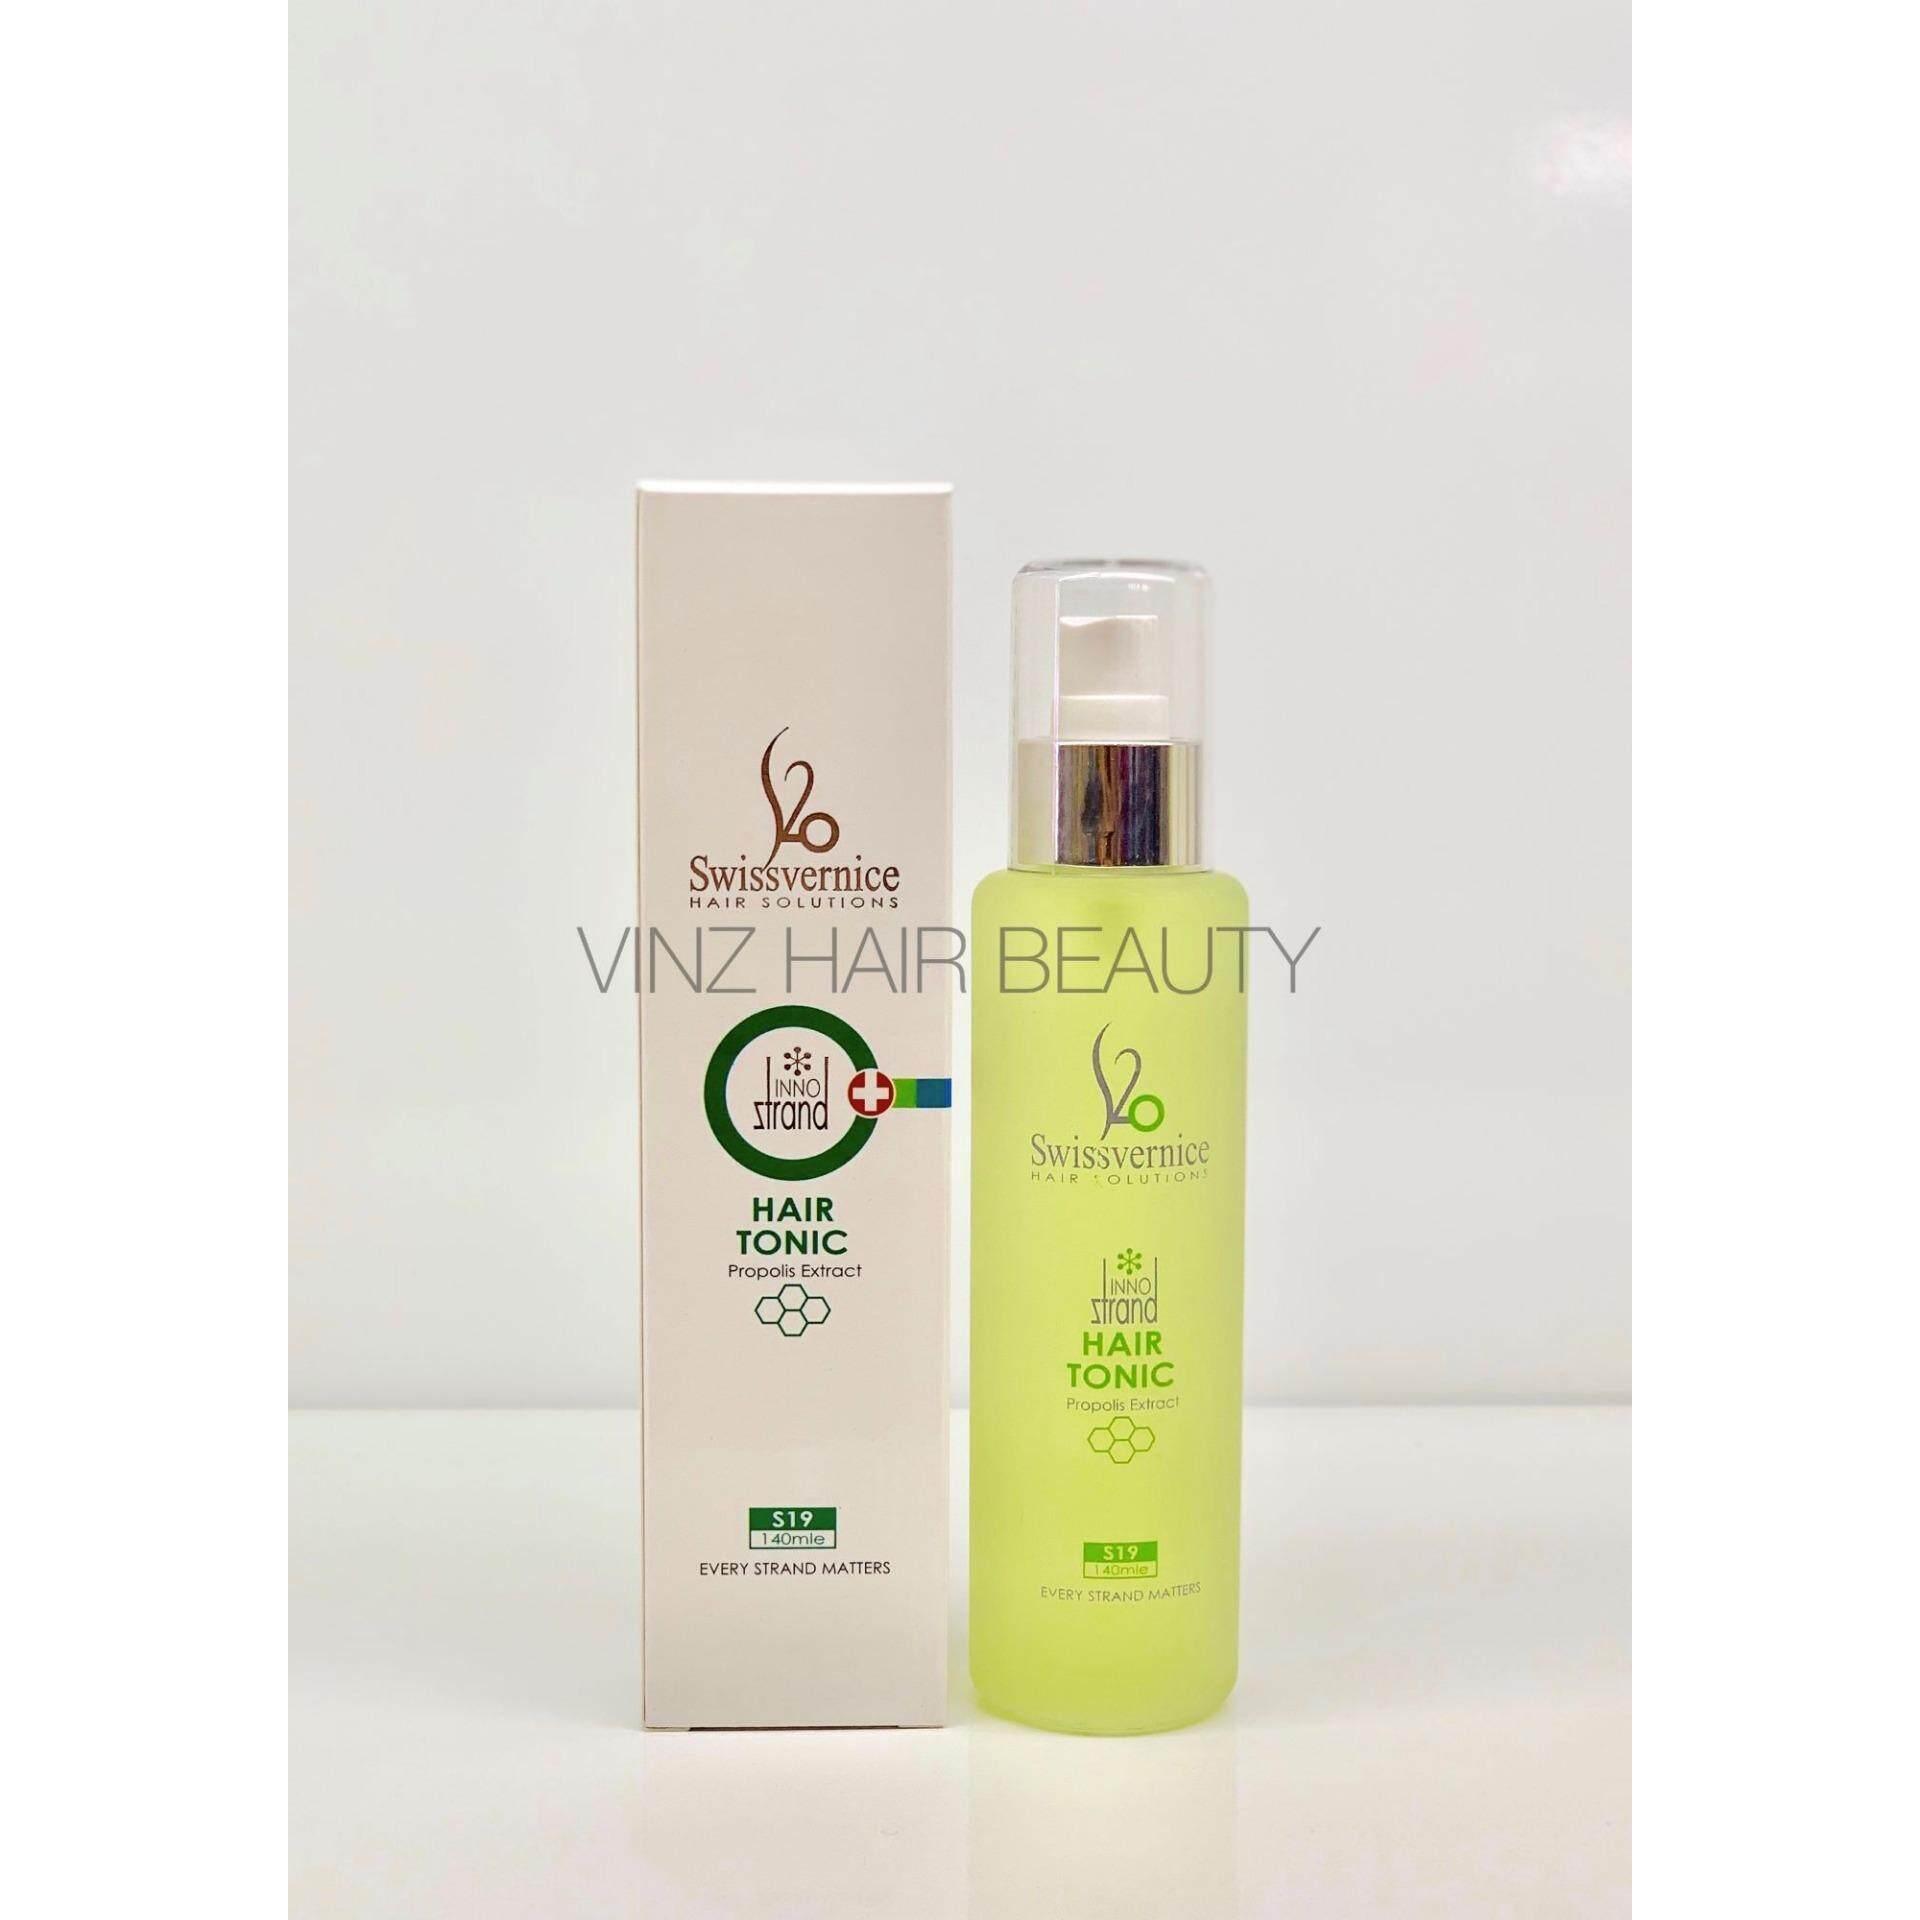 Swissvernice s2o Inno Strand Hair Tonic Propolis Extract 140ml